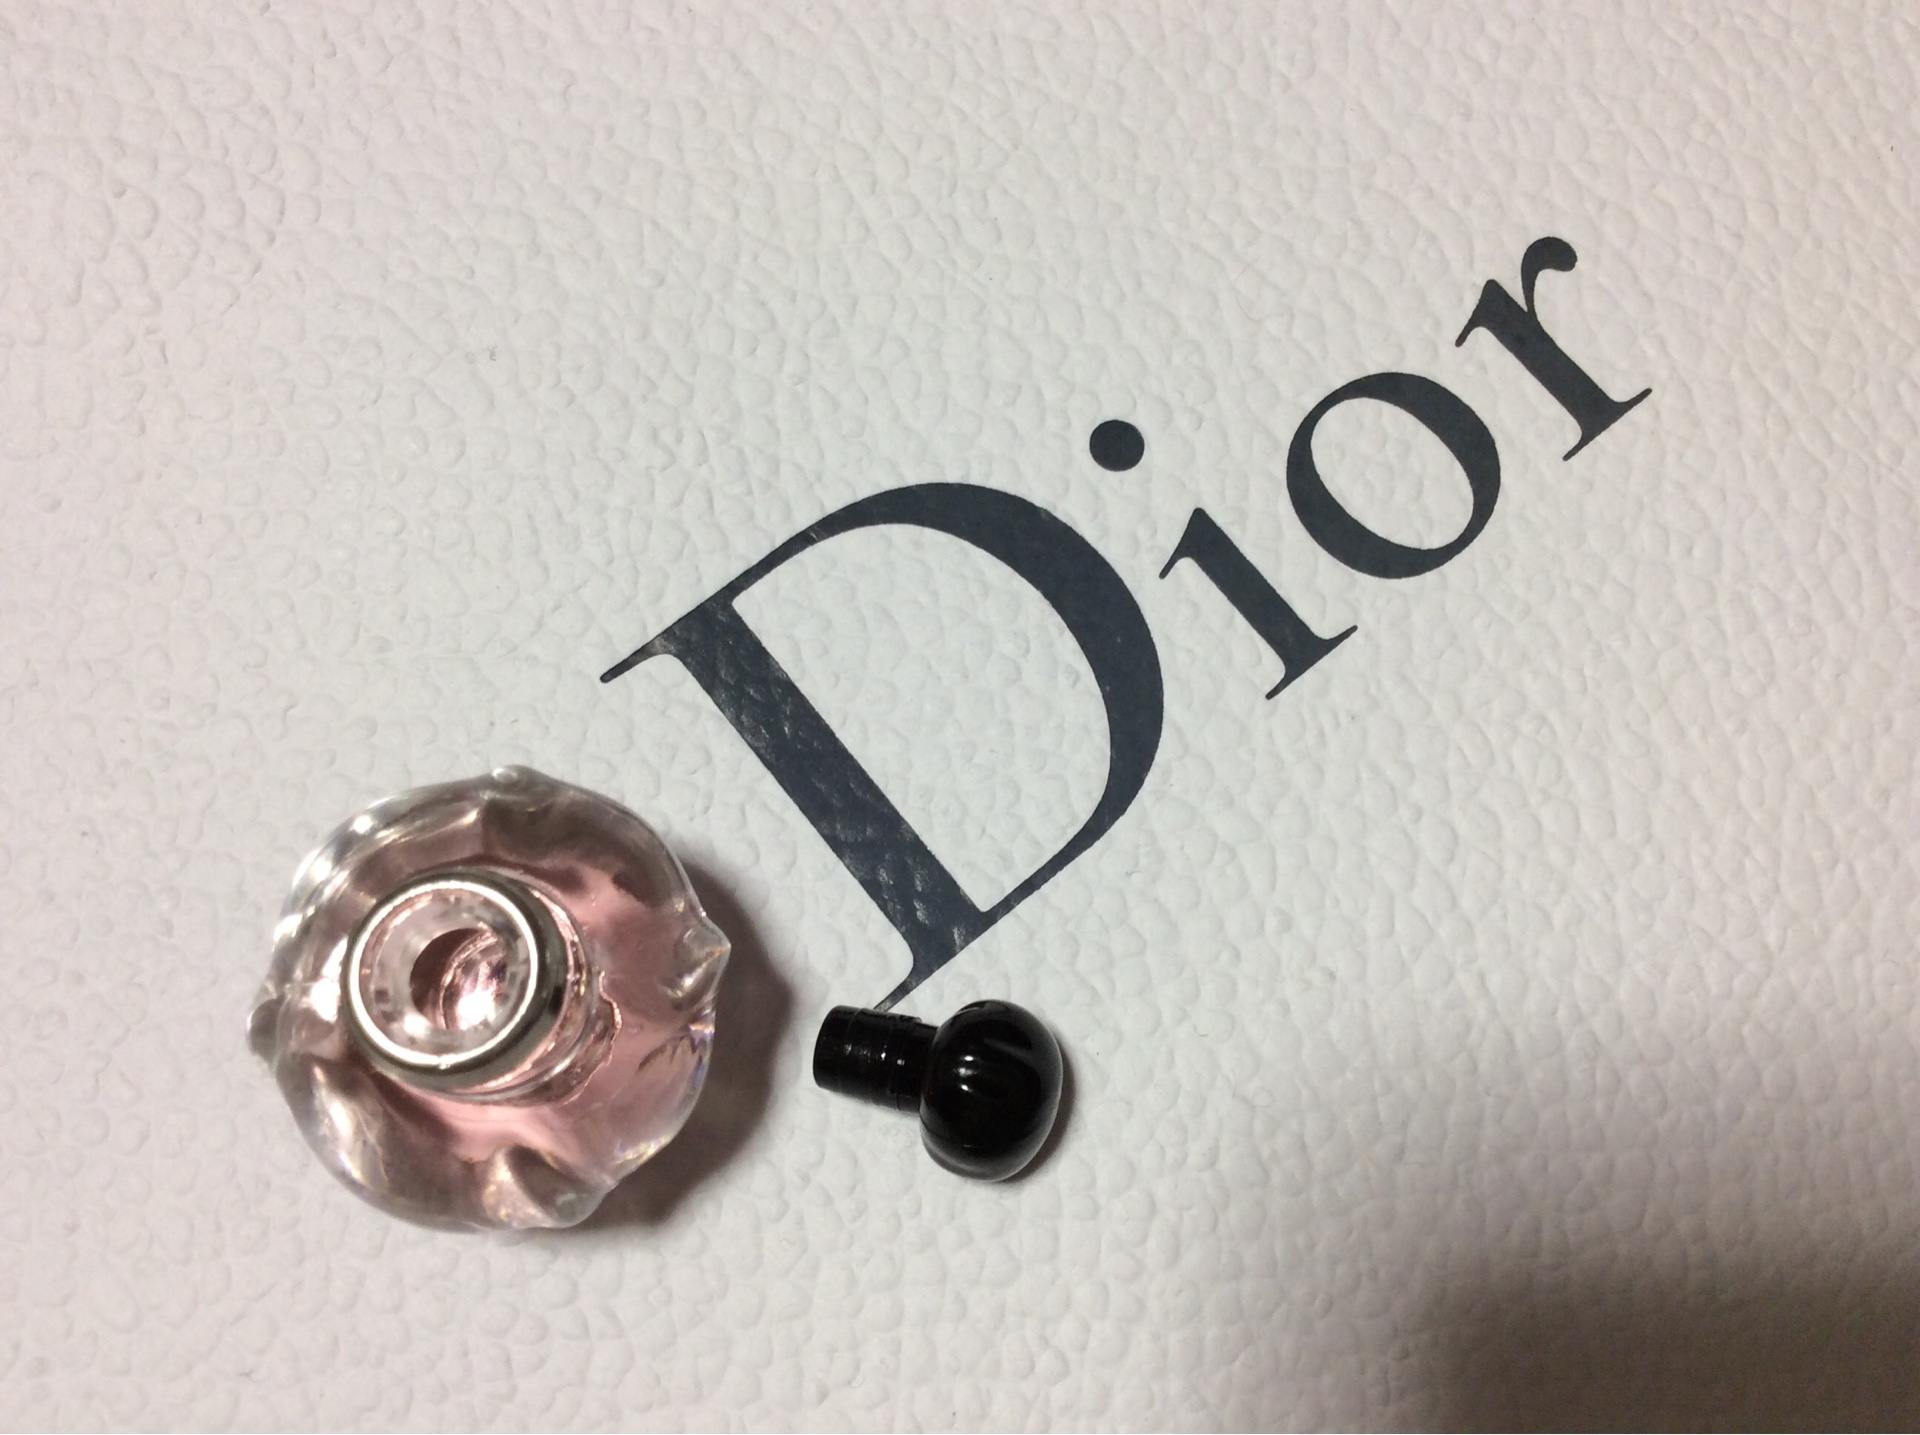 Dior プワゾンガール ミニチュアはコルクが開けづらい